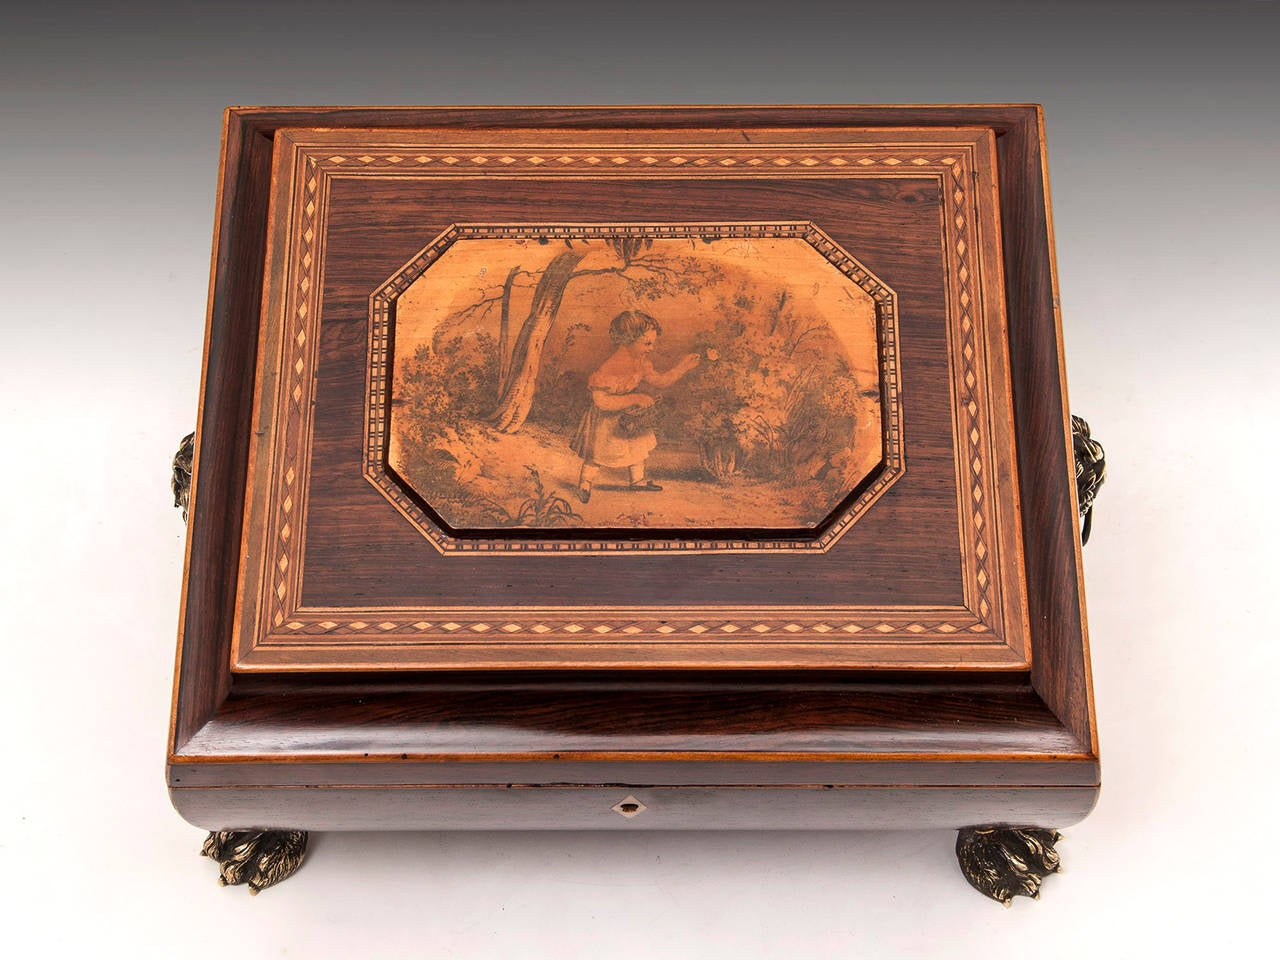 19th Century Regency Bombe Shape Mahogany Sewing Box For Sale 1